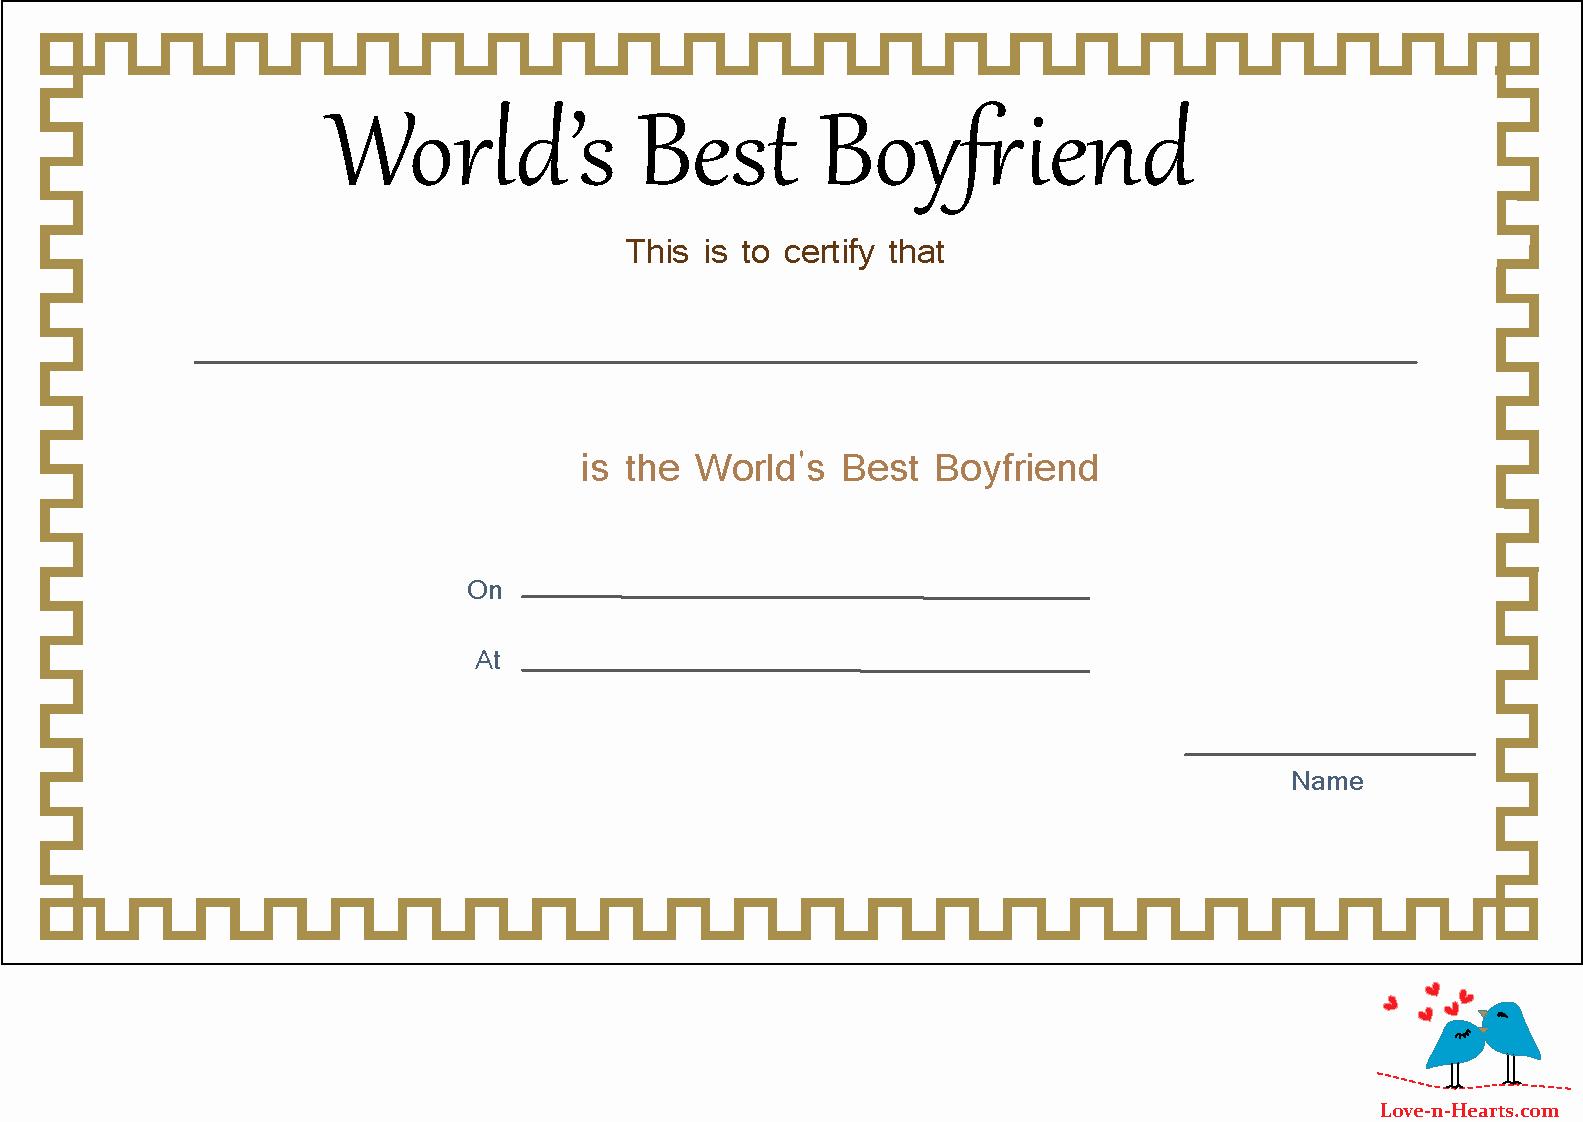 Best Boyfriend Award Printable Awesome Free Printable World S Best Boyfriend Certificates